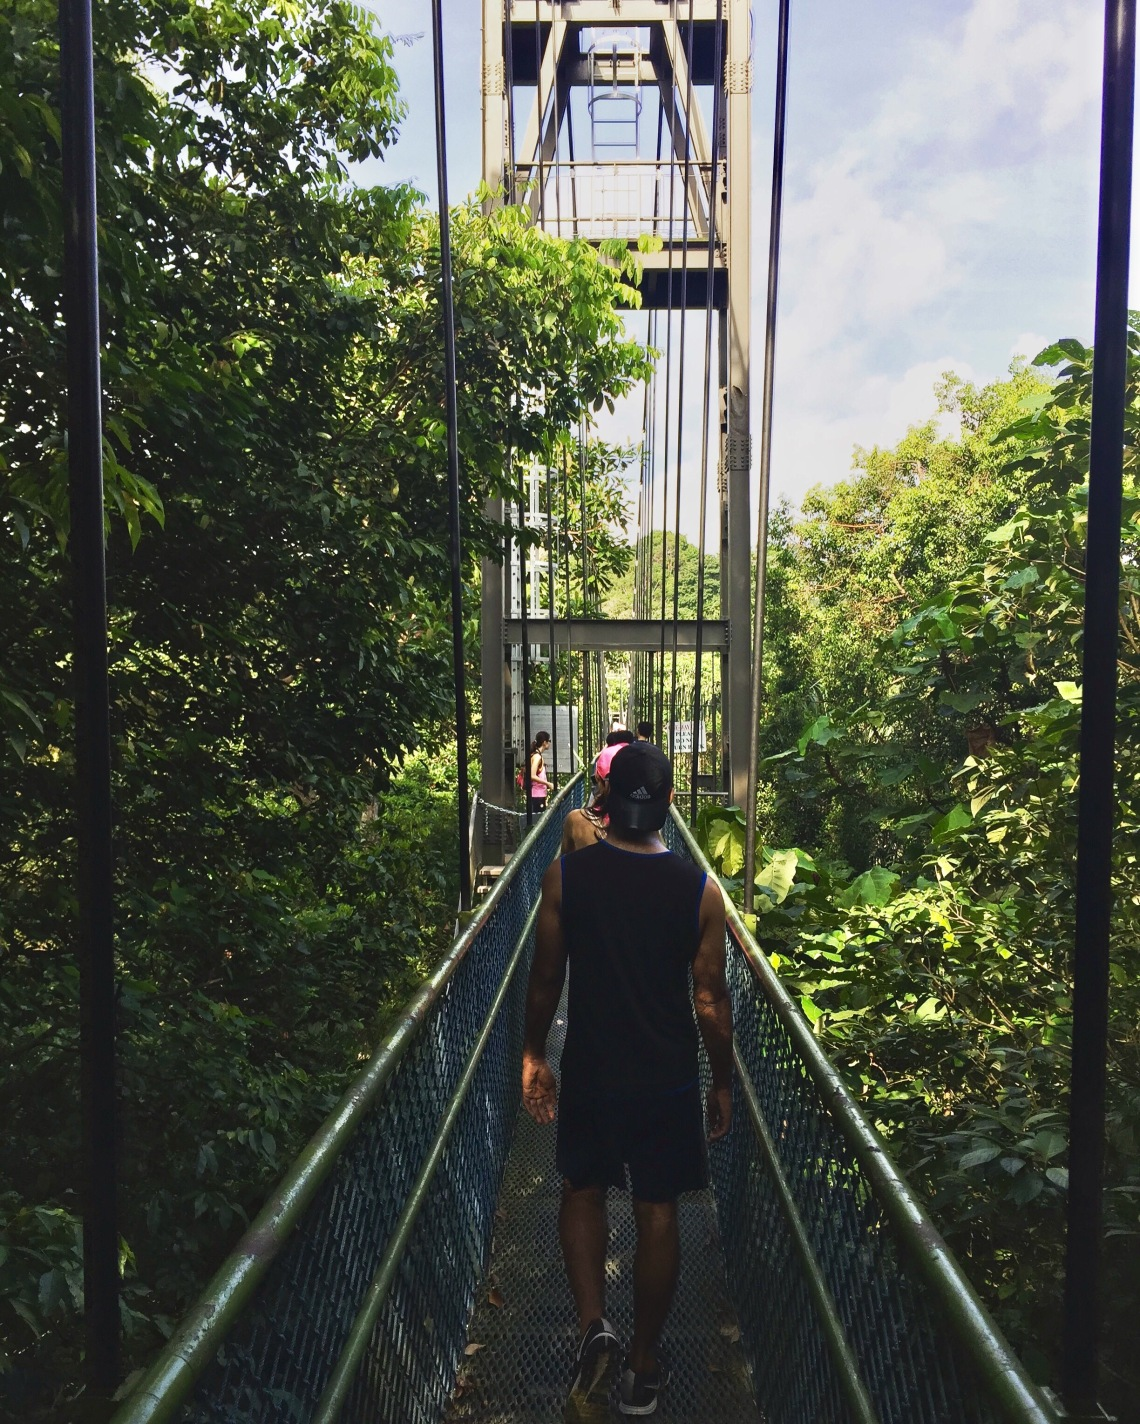 MacRitcie Tree Top Walk